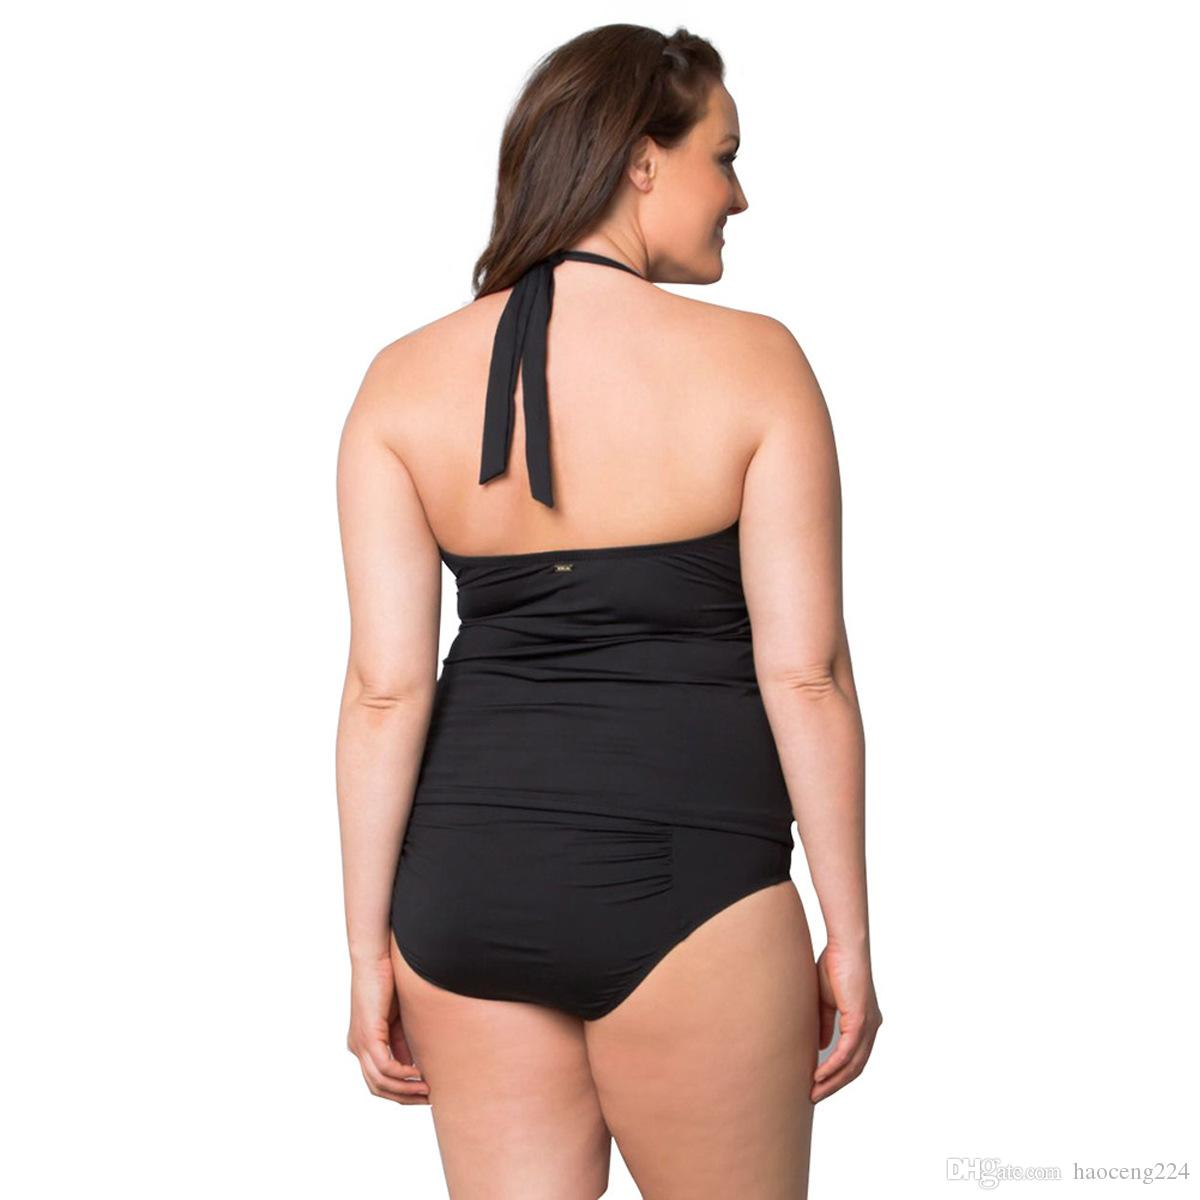 Plus Size maillot de bain One Piece Sexy Femmes Swinwear Deep V Body bikini Body Halter solide Hip Up femmes maillot de bain Beachwear Monokini gros